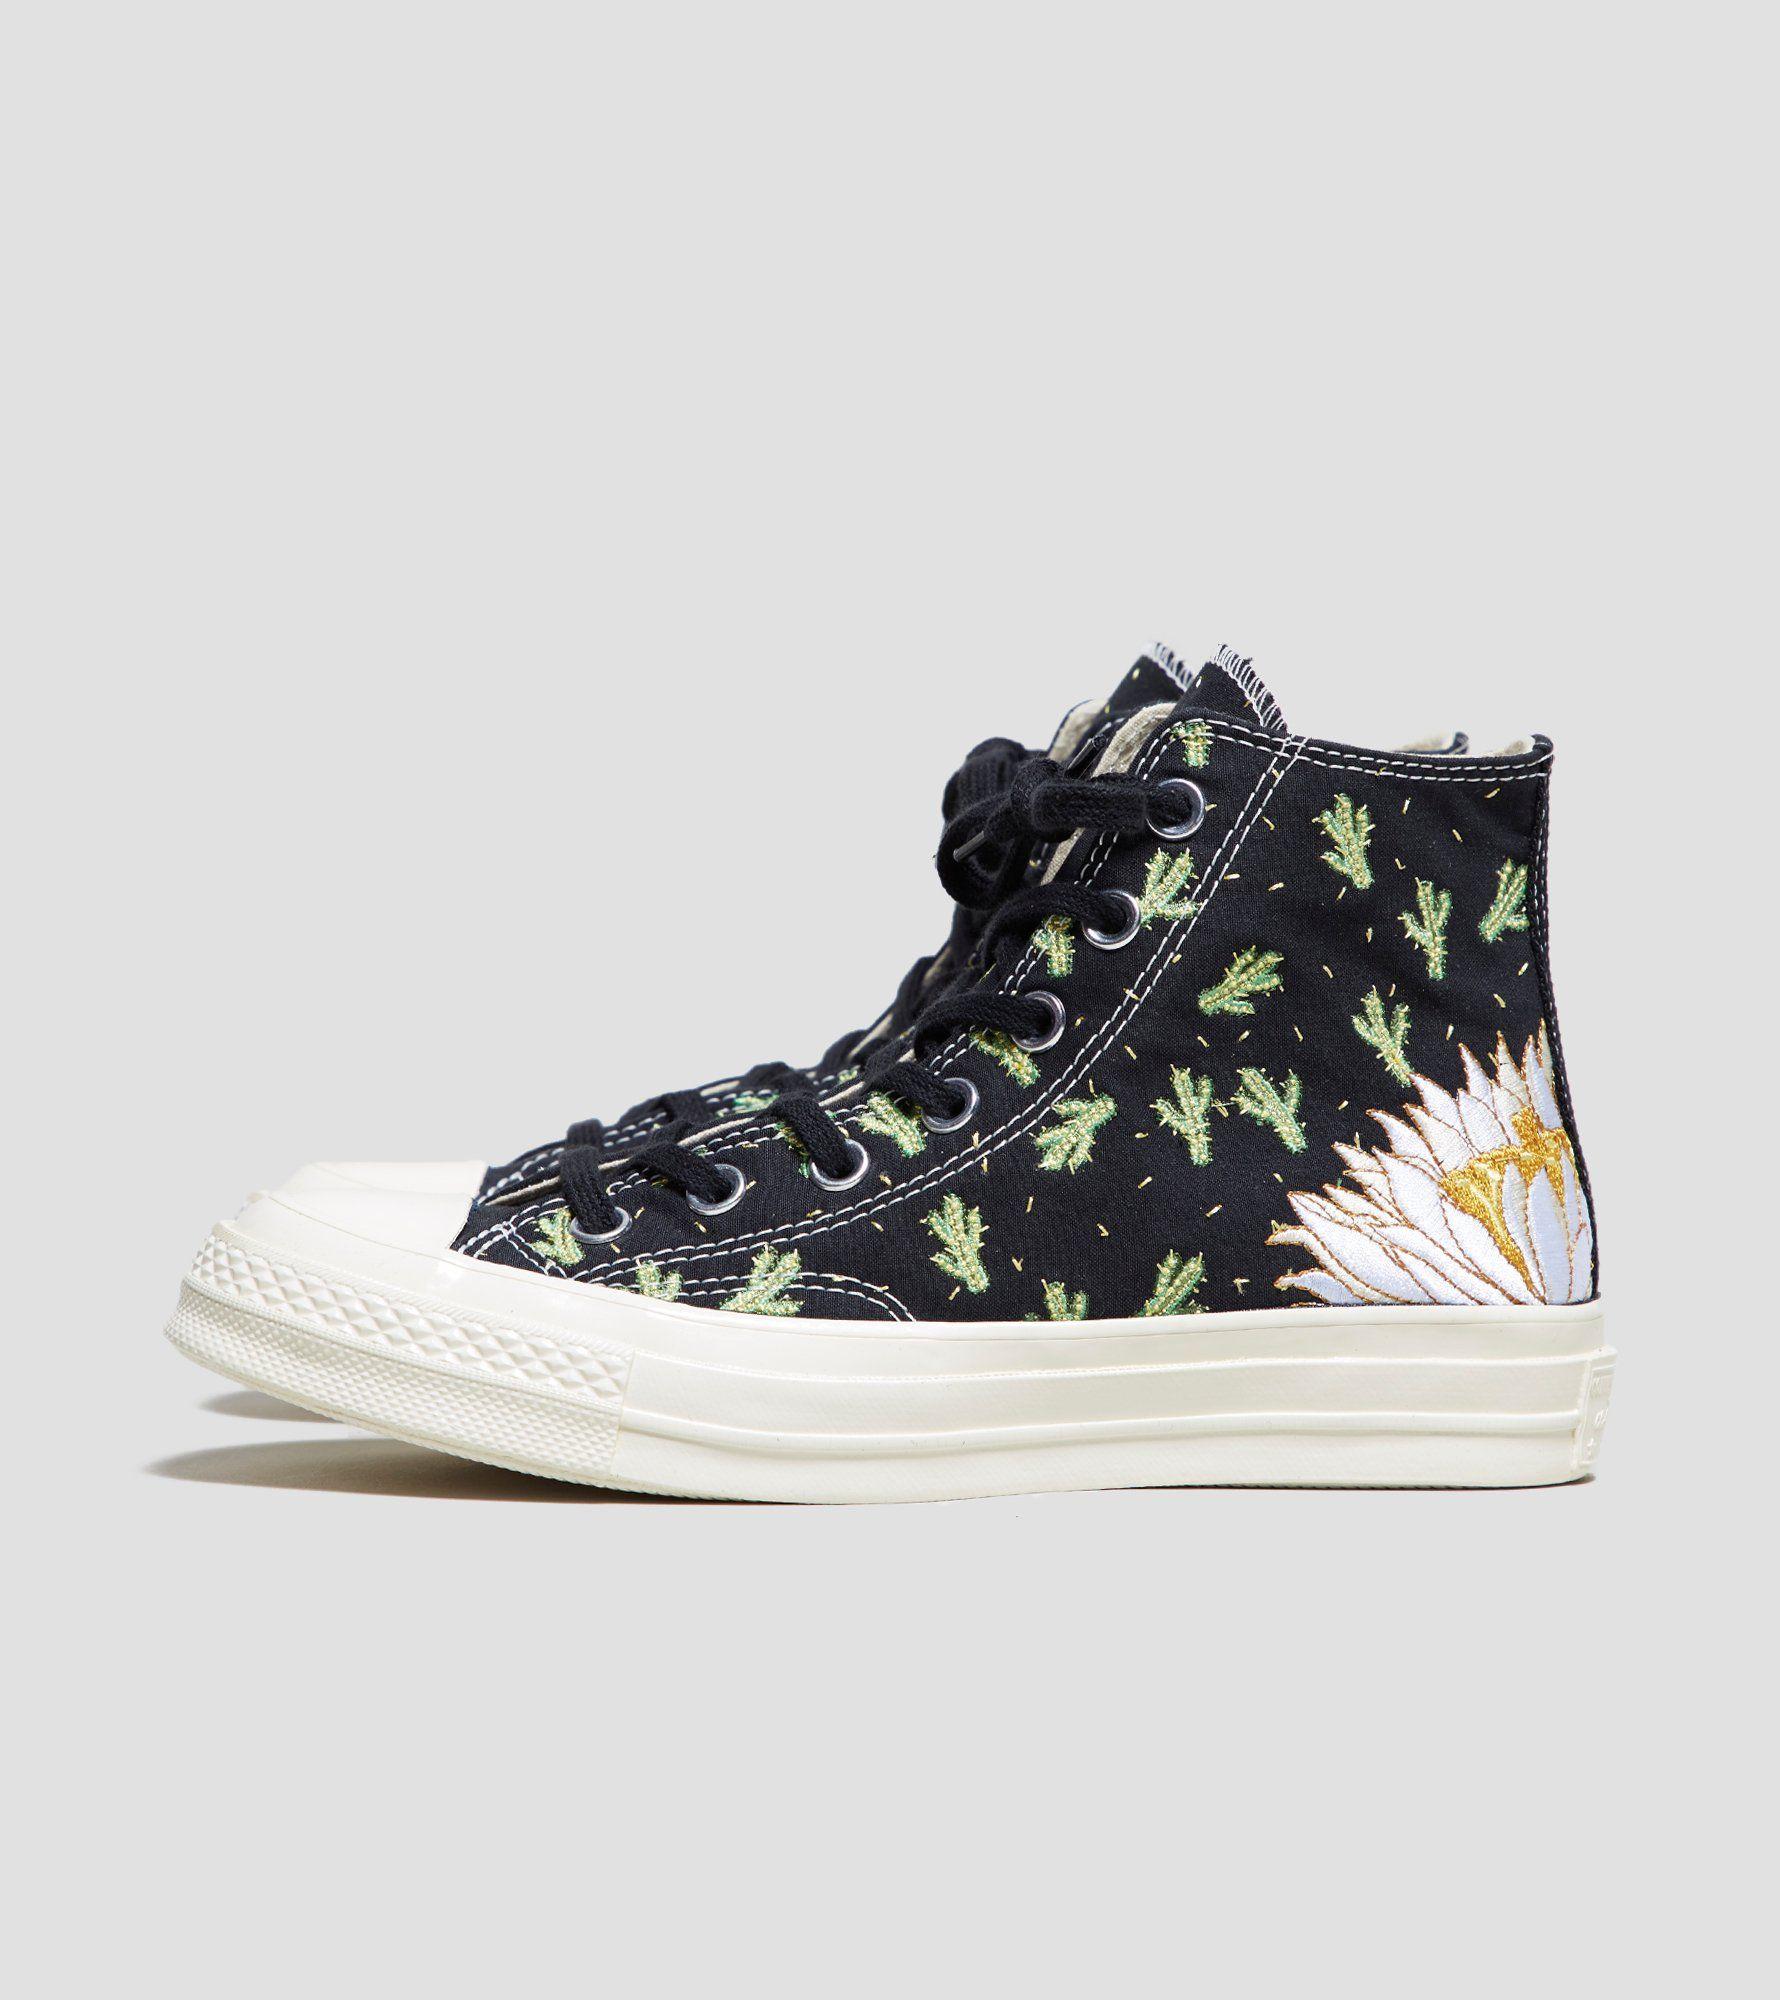 Converse Chuck Taylor All Star '70 'Prep Embroidery Til Kvinder